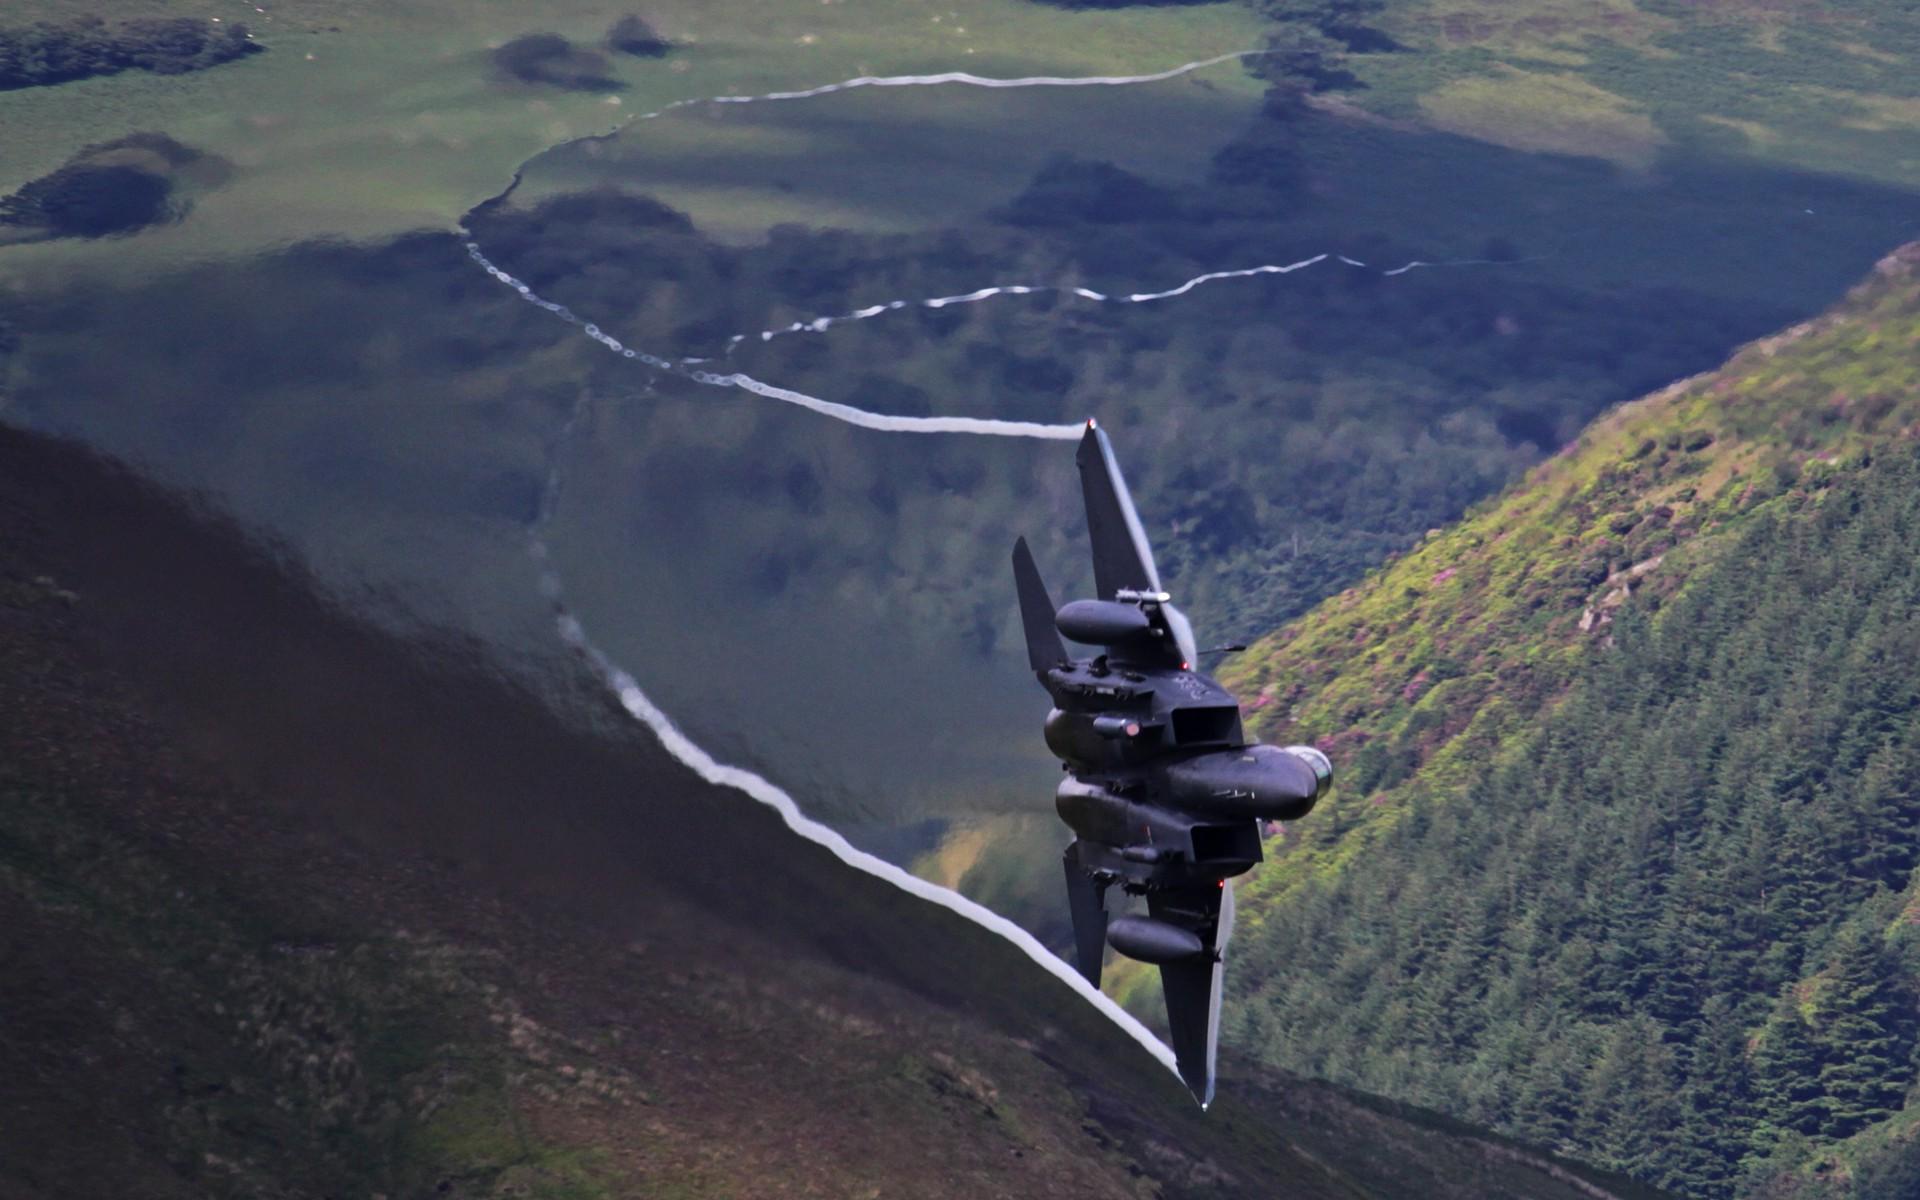 wallpaper : trees, sky, war, airplane, aircraft, military, mountain